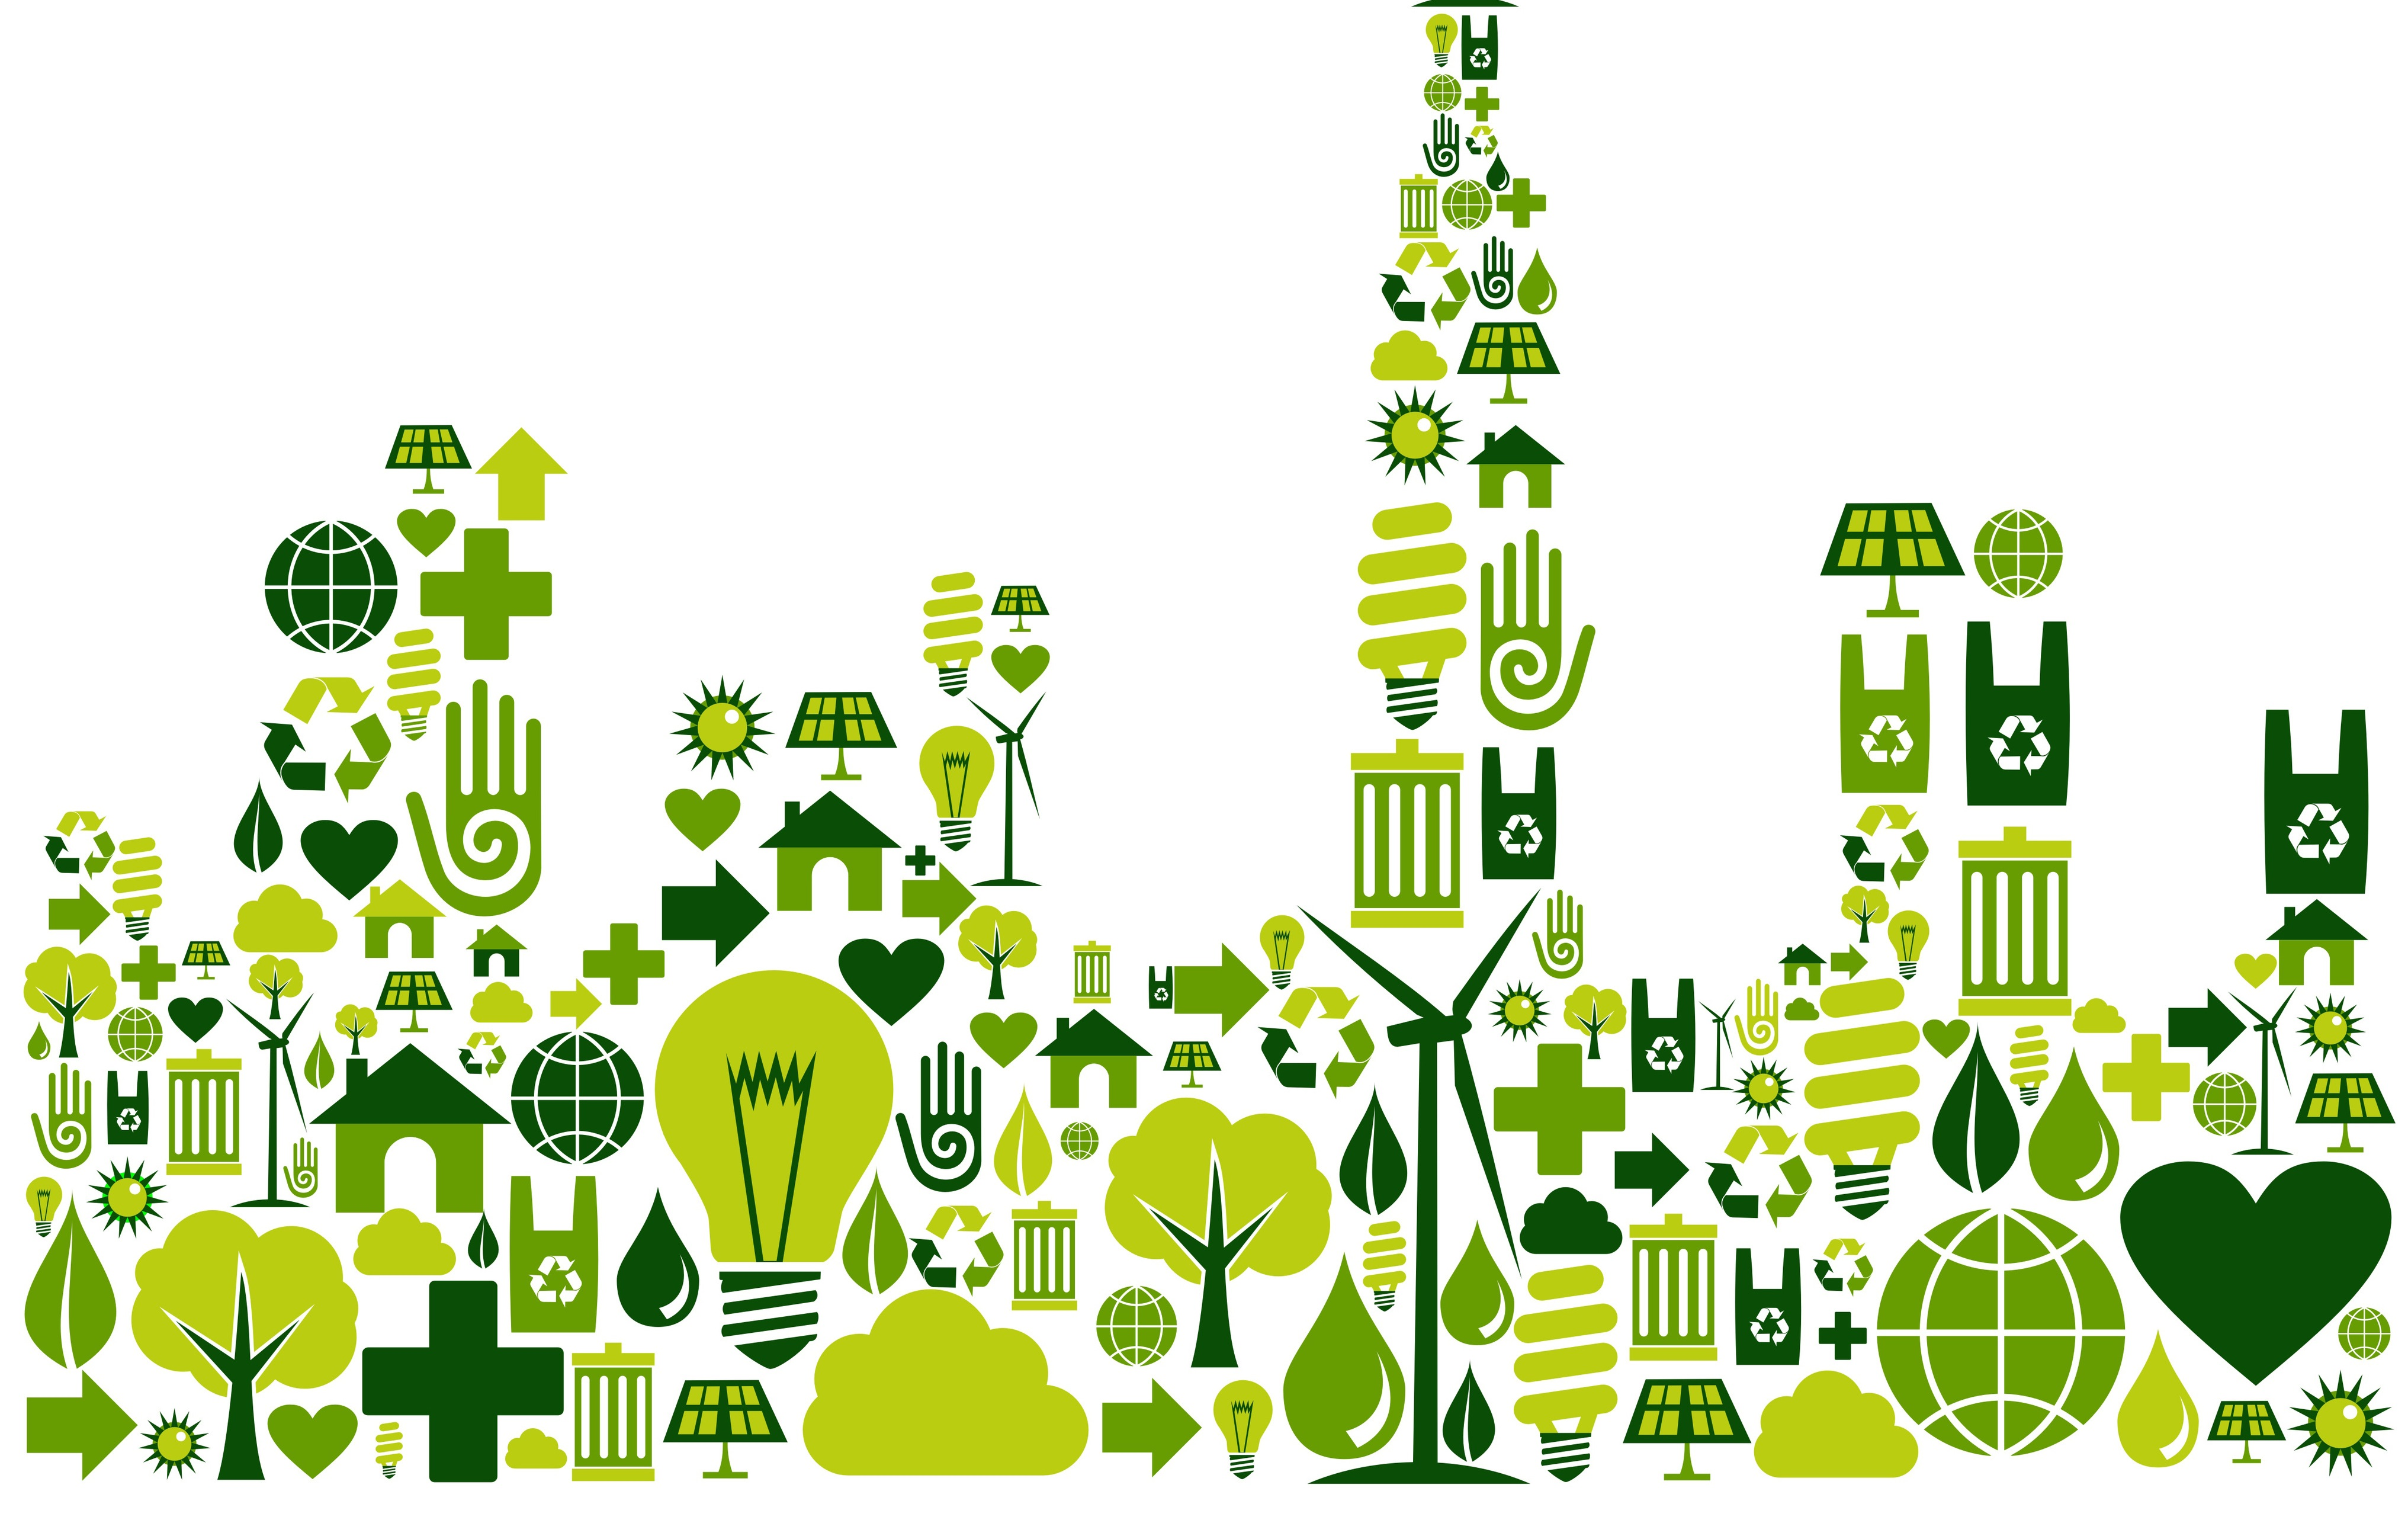 اصول یک طراحی پایدار - The principles of a sustainable design